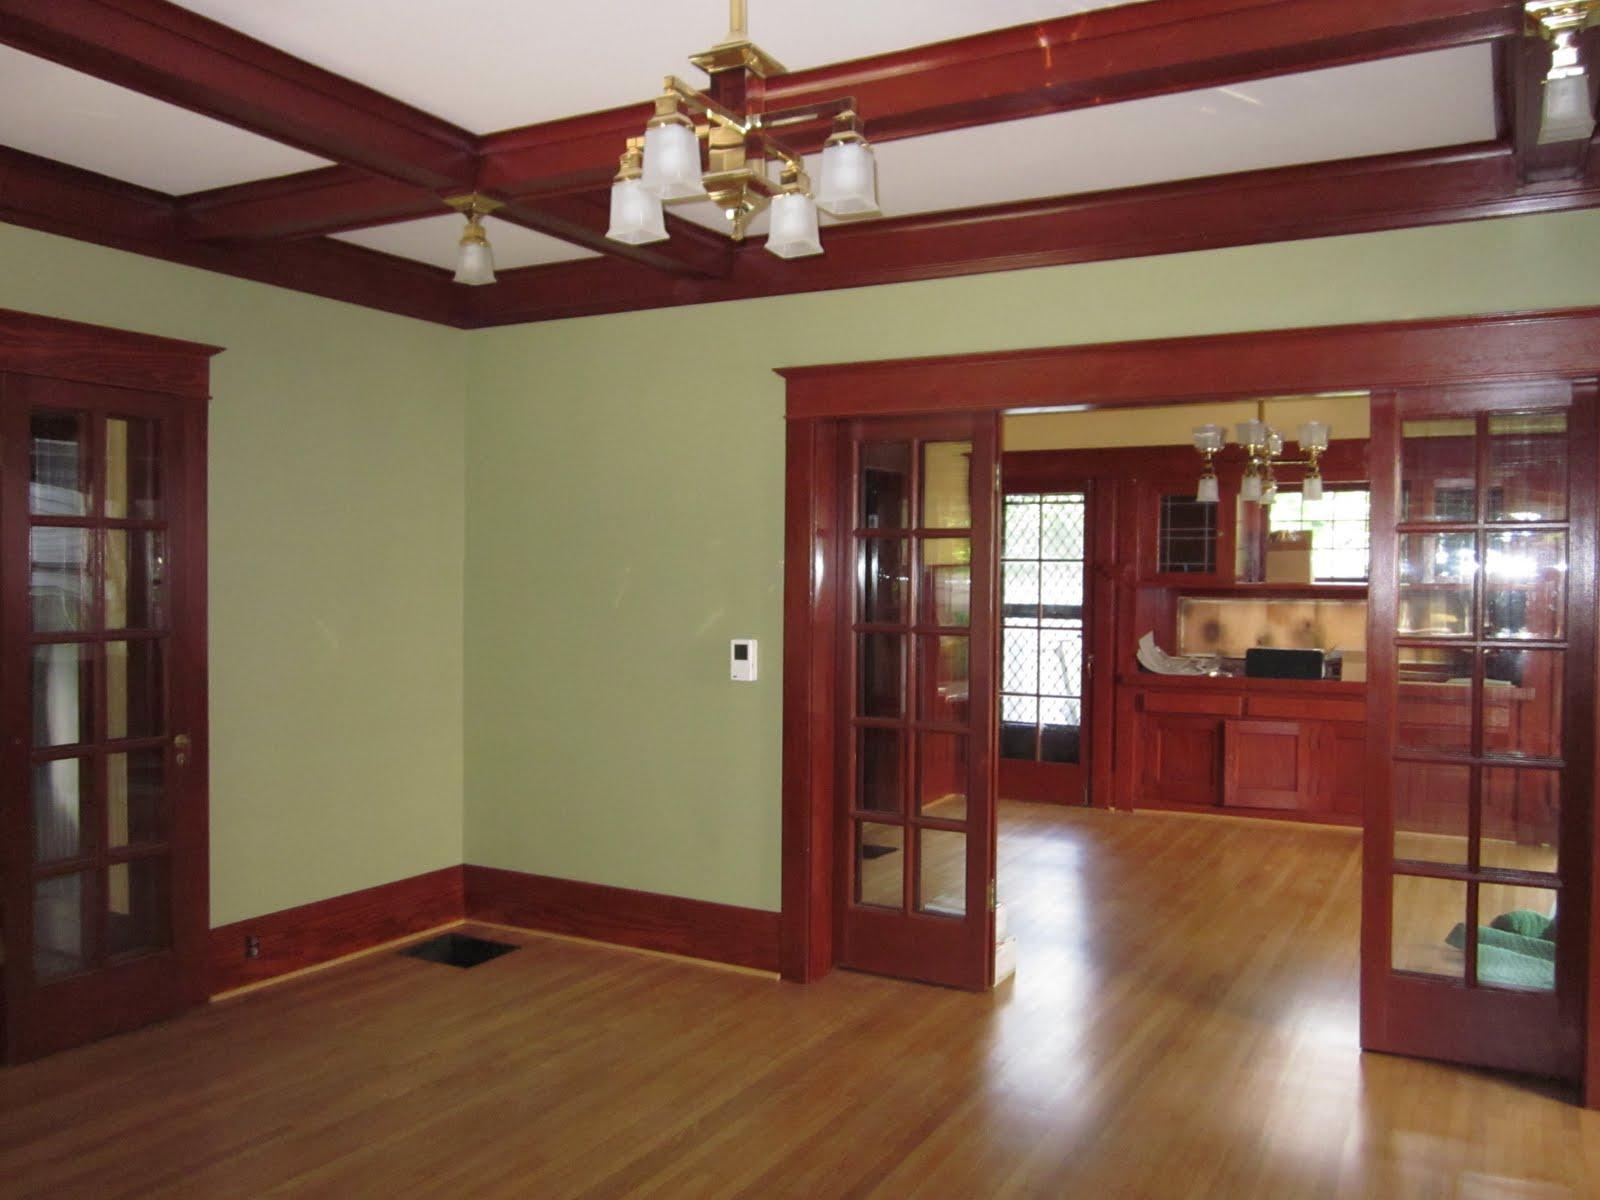 Laurelhurst craftsman bungalow living room photos - House color schemes interior ...